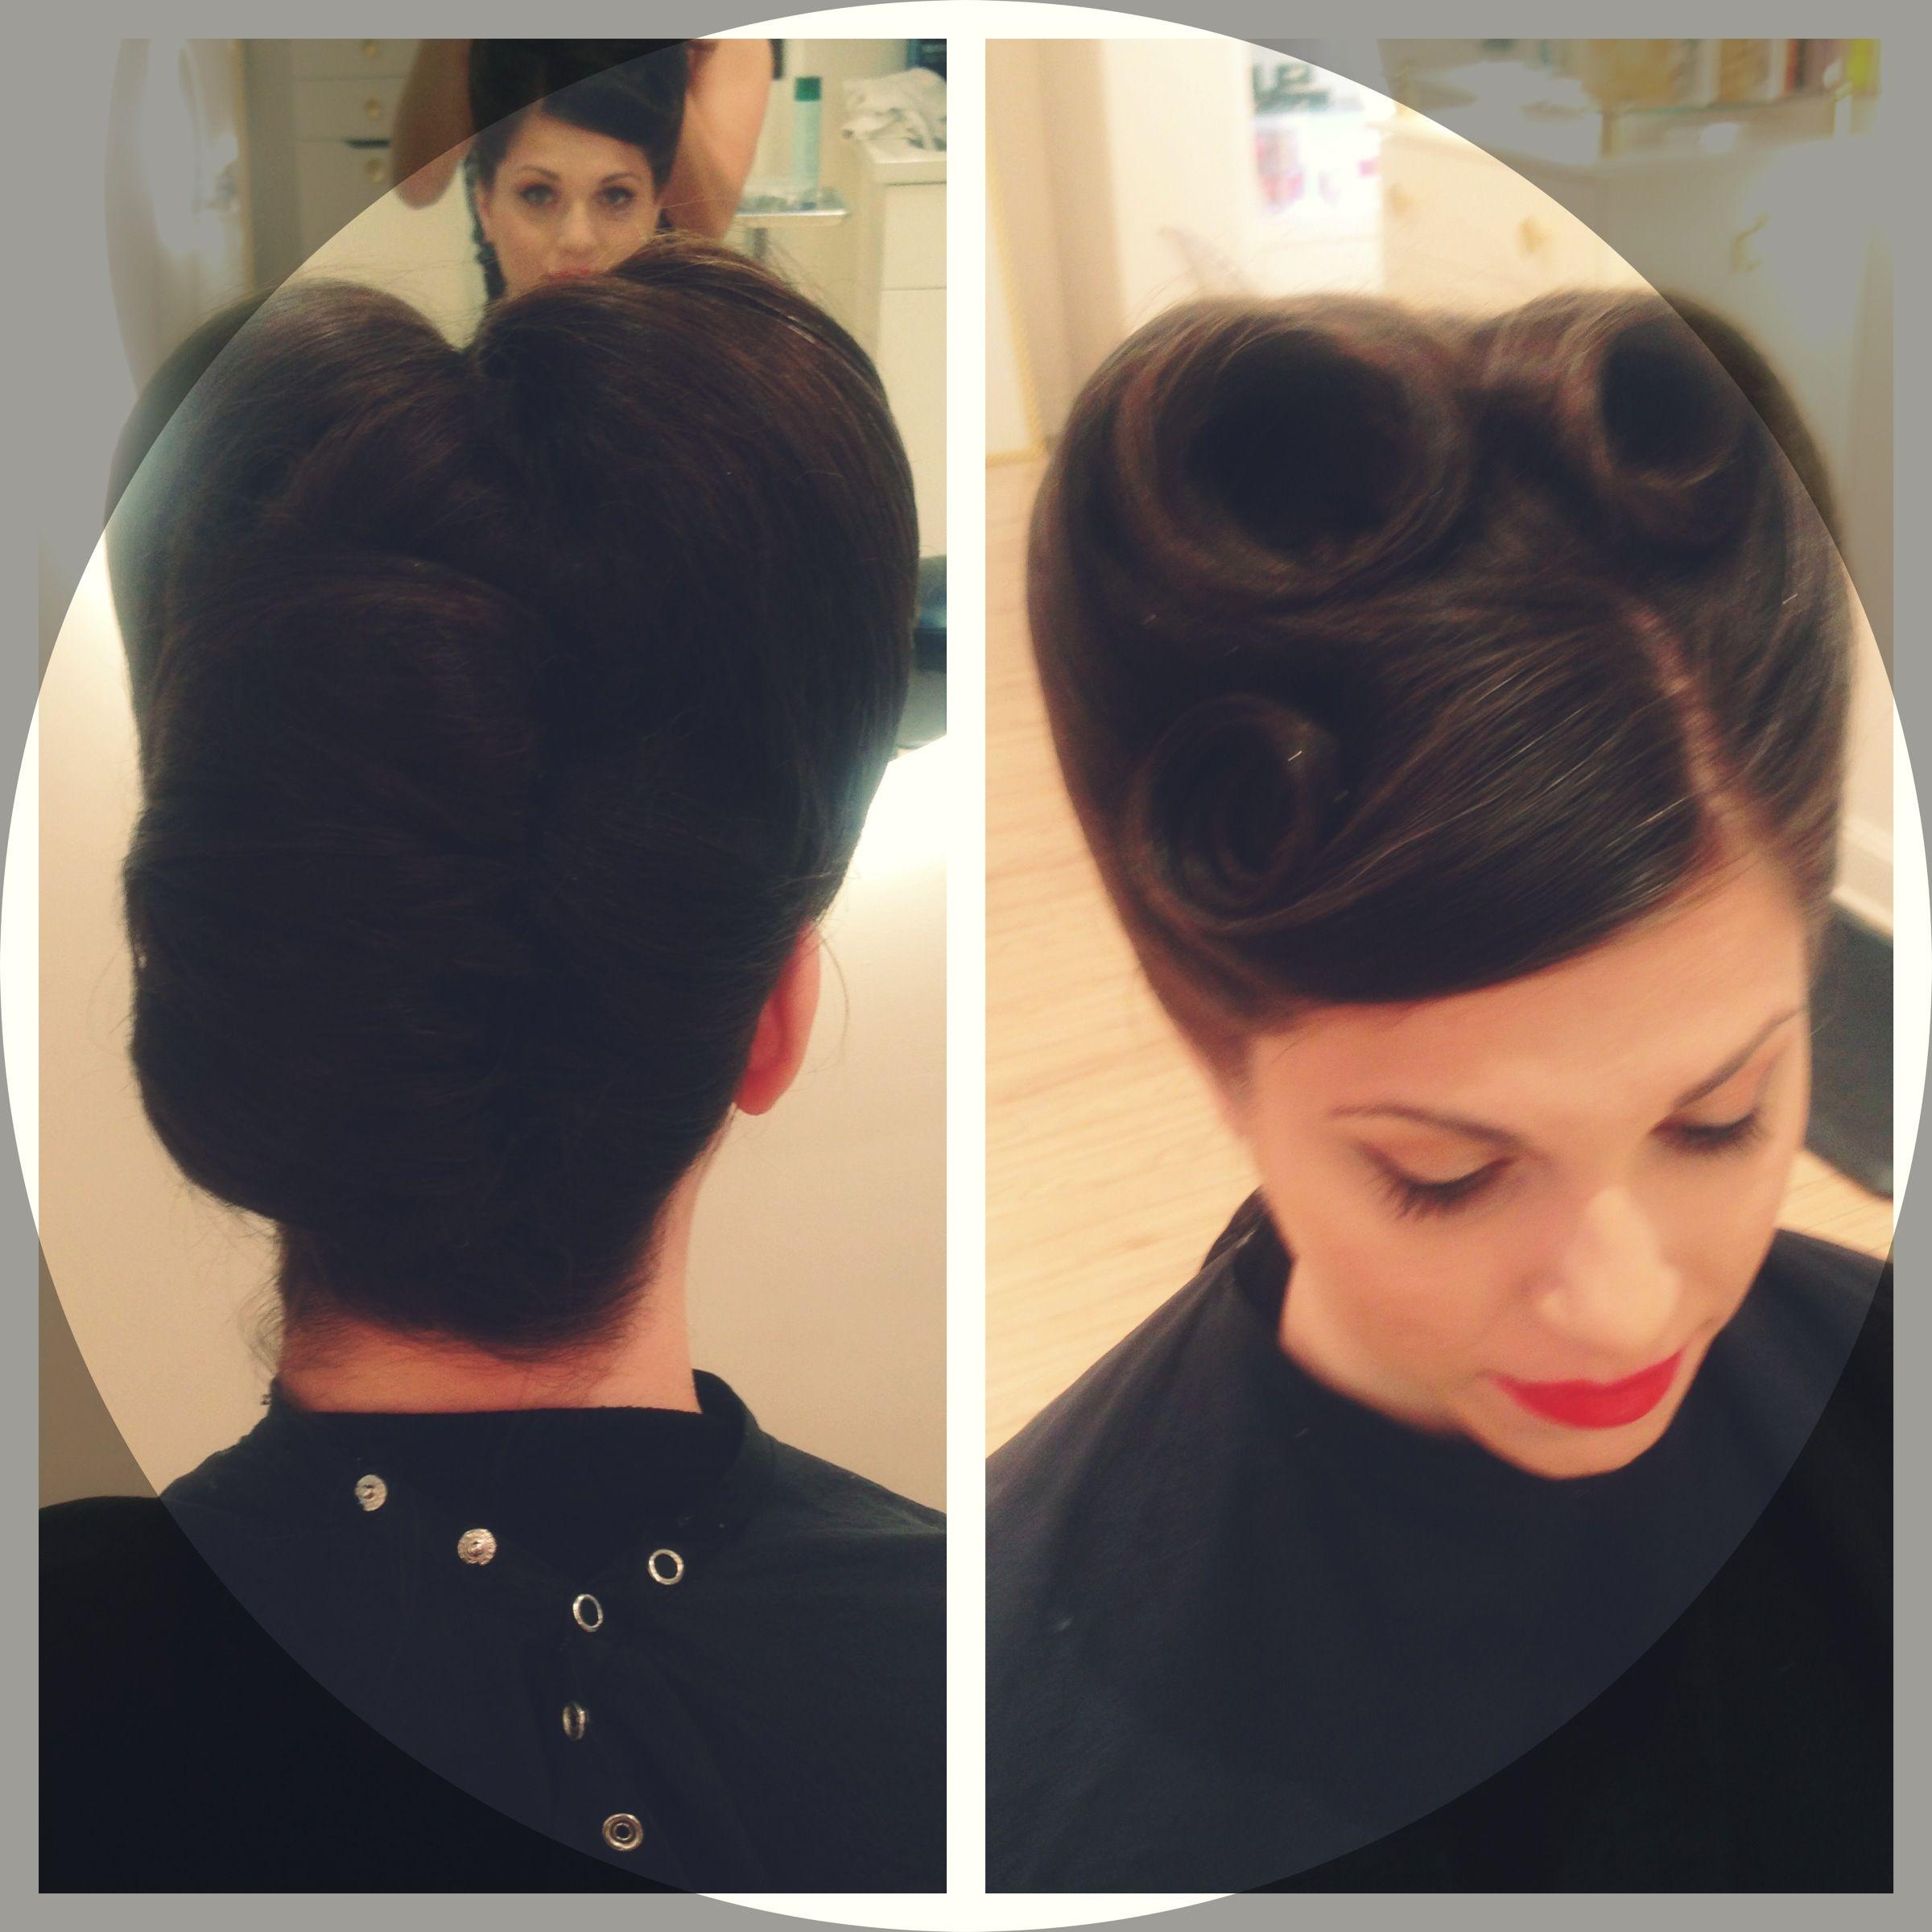 Rockabilly hairstyles hair pinterest rockabilly vintage hair